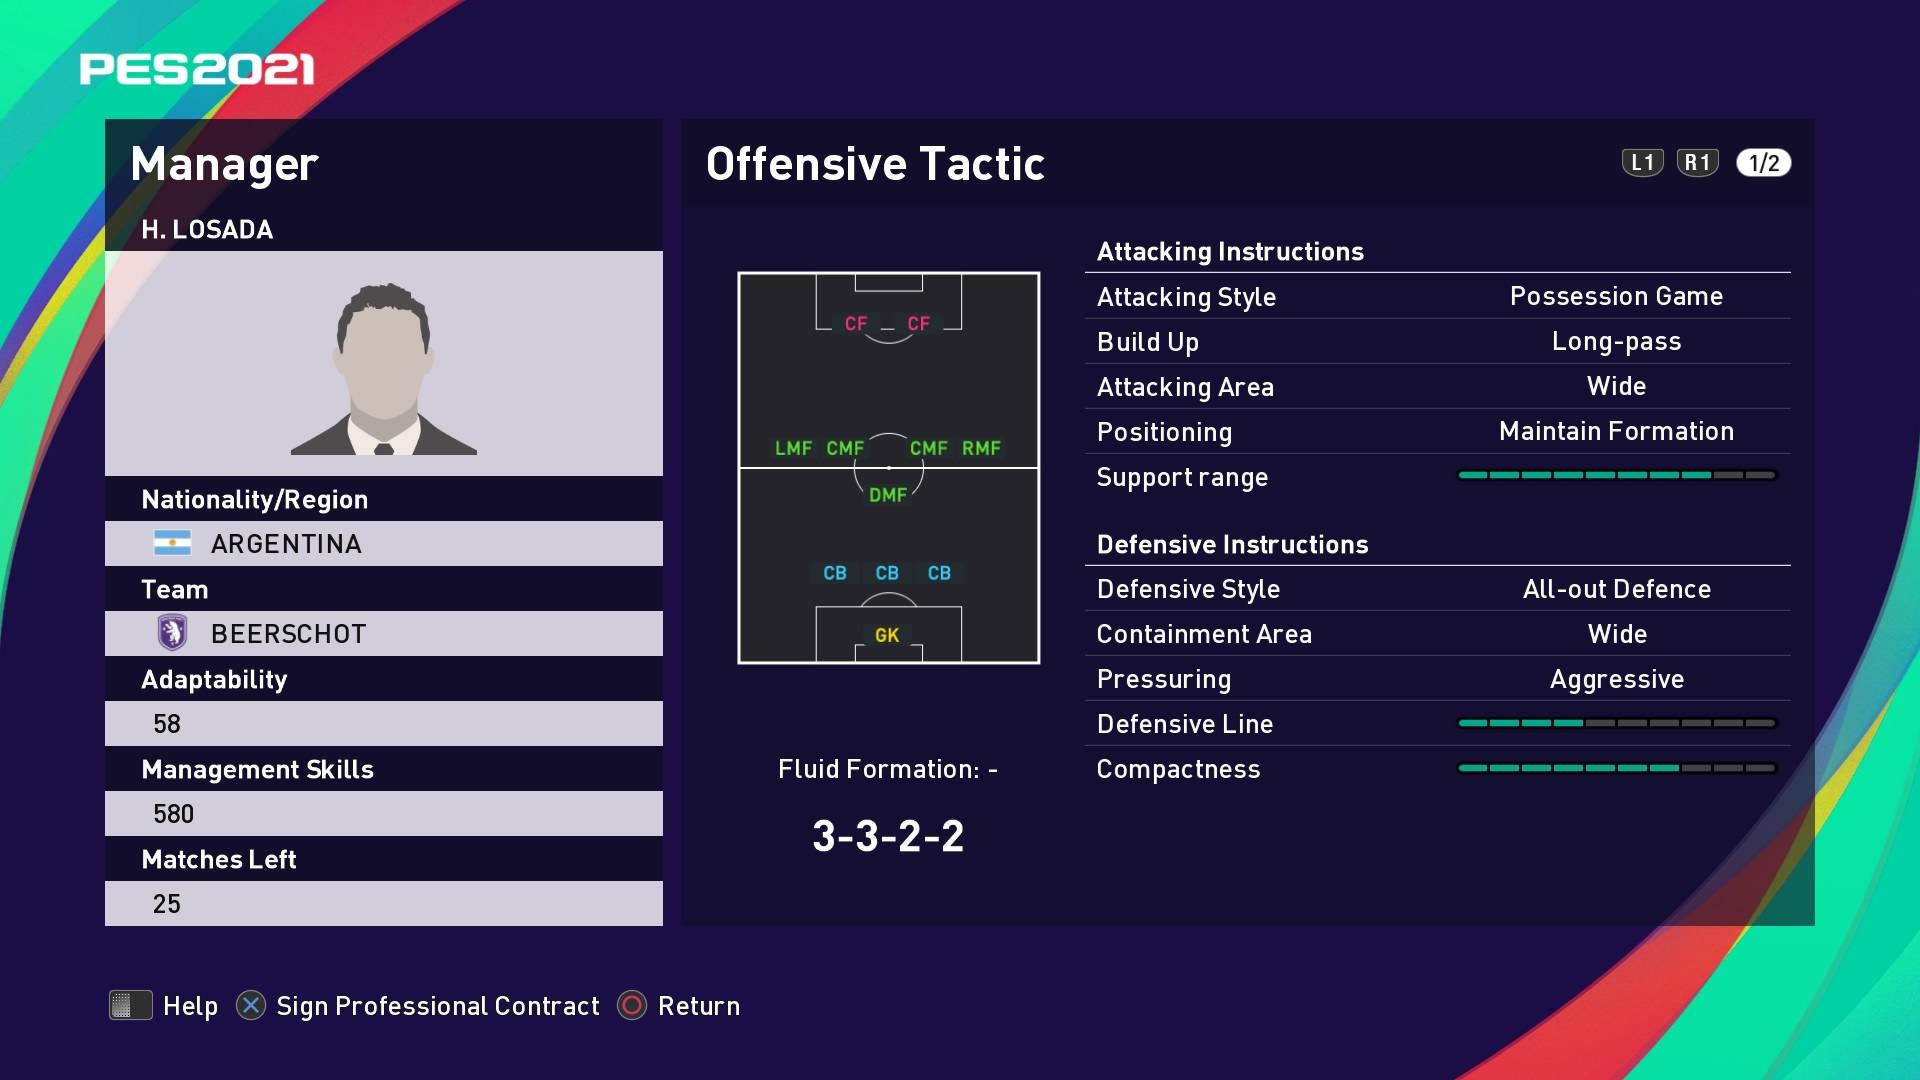 H. Losada (Hernán Losada) Offensive Tactic in PES 2021 myClub